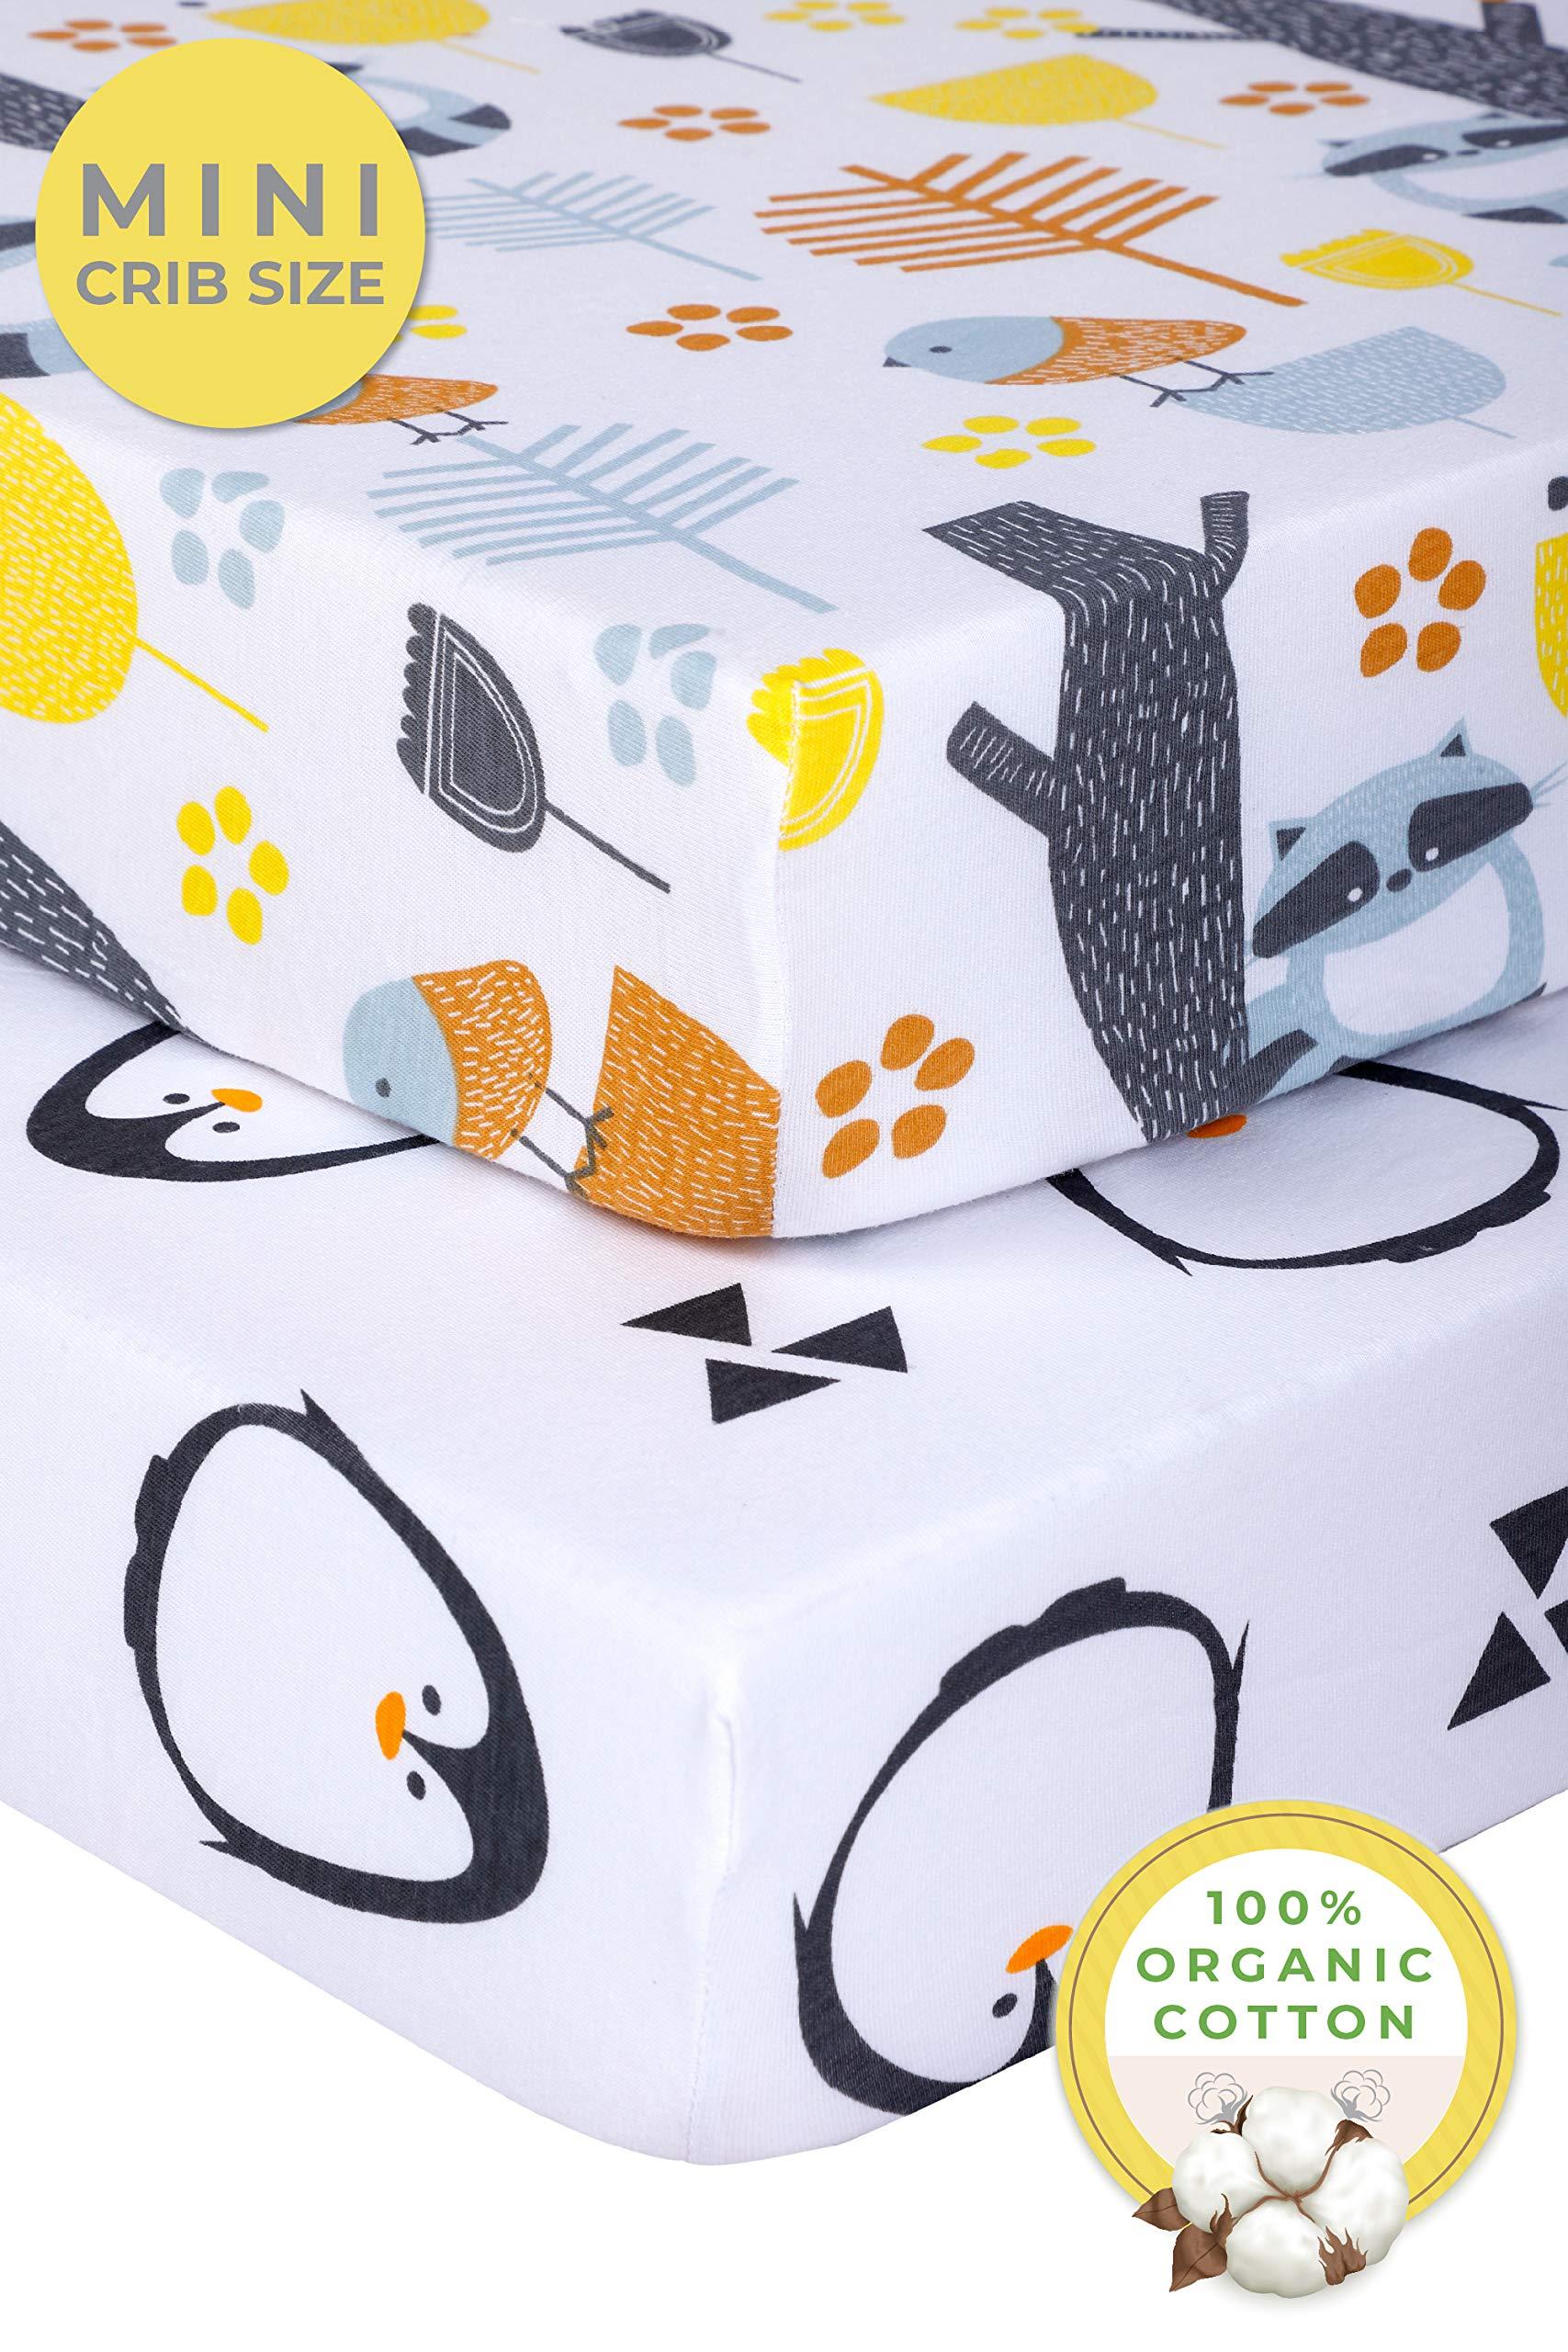 Pickle & Pumpkin Mini Crib Sheet Set | 2 Pack Pack N Play Sheets in 100% Organic Jersey Cotton | Girls & Boys | Ideal as Pack and Play Mattress, Playpen, Playard Sheets | Penguin & Woodland by Pickle & Pumpkin